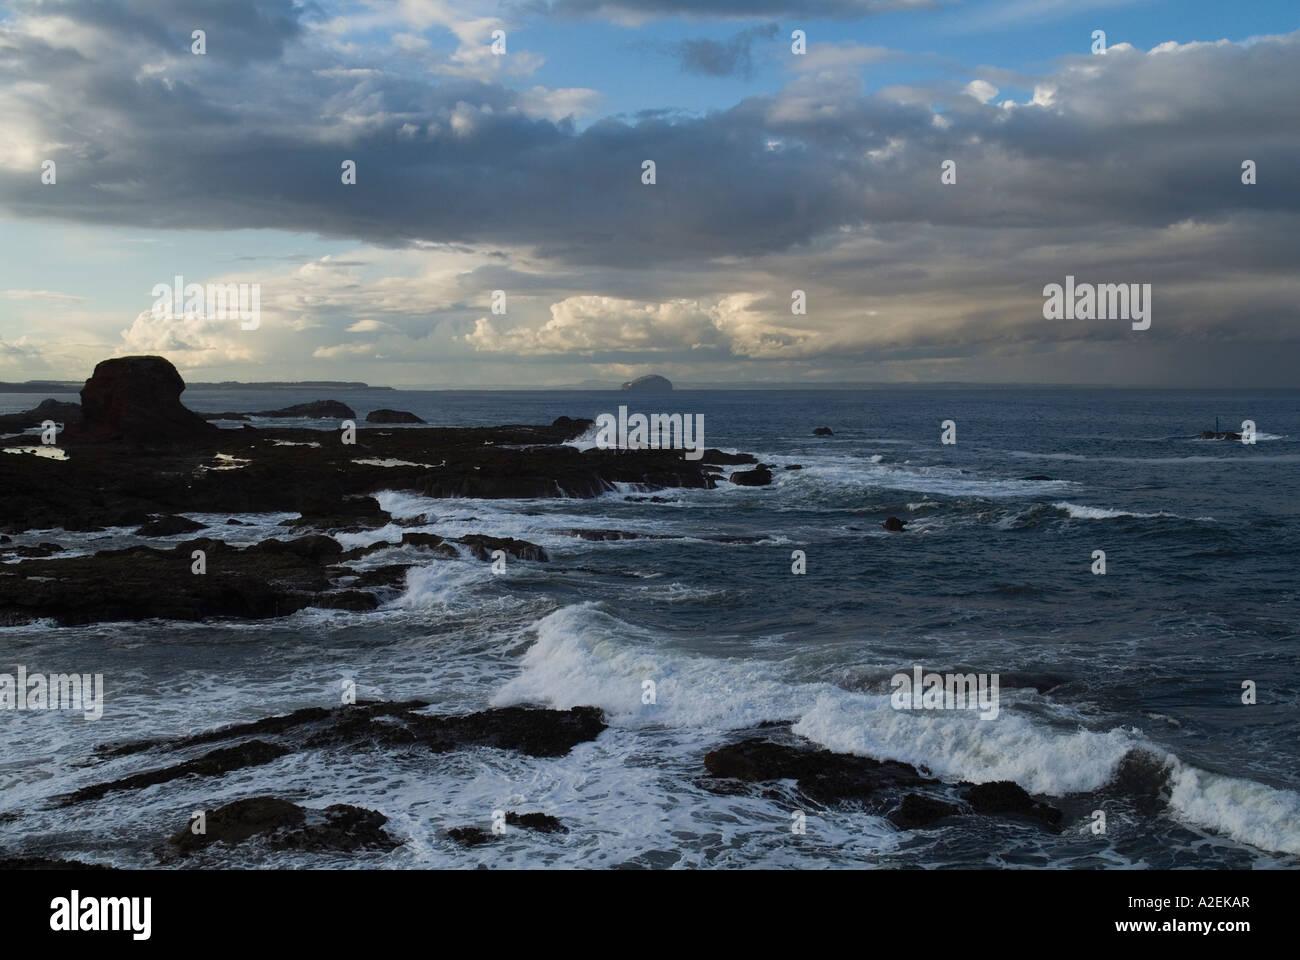 dh Firth of Forth DUNBAR LOTHIAN Scotland North Sea stormy wind waves coast and Bass Rock scottish shore storm crashing seacoast winds Stock Photo